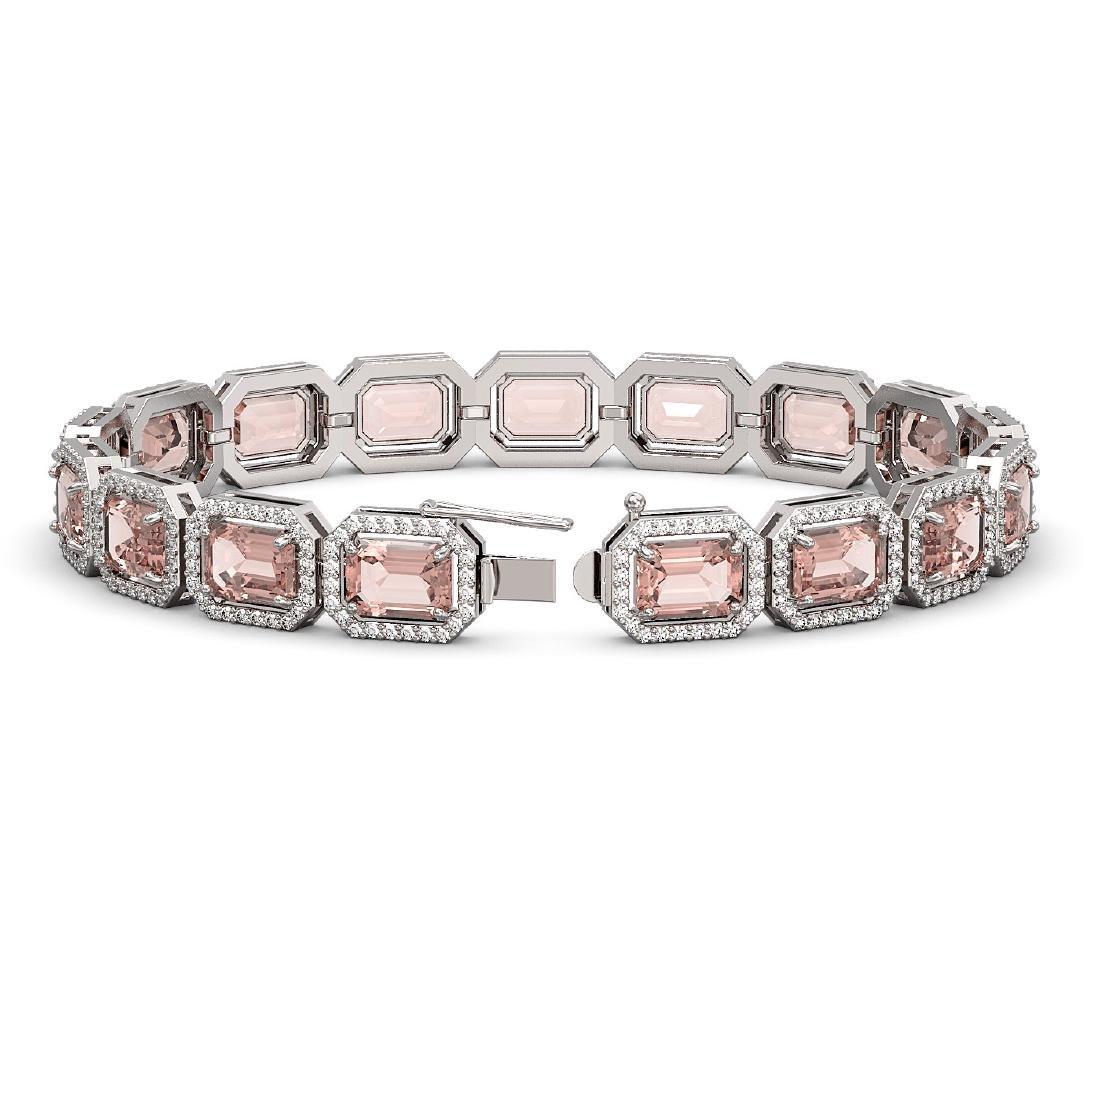 22.81 ctw Morganite & Diamond Halo Bracelet 10K White - 2